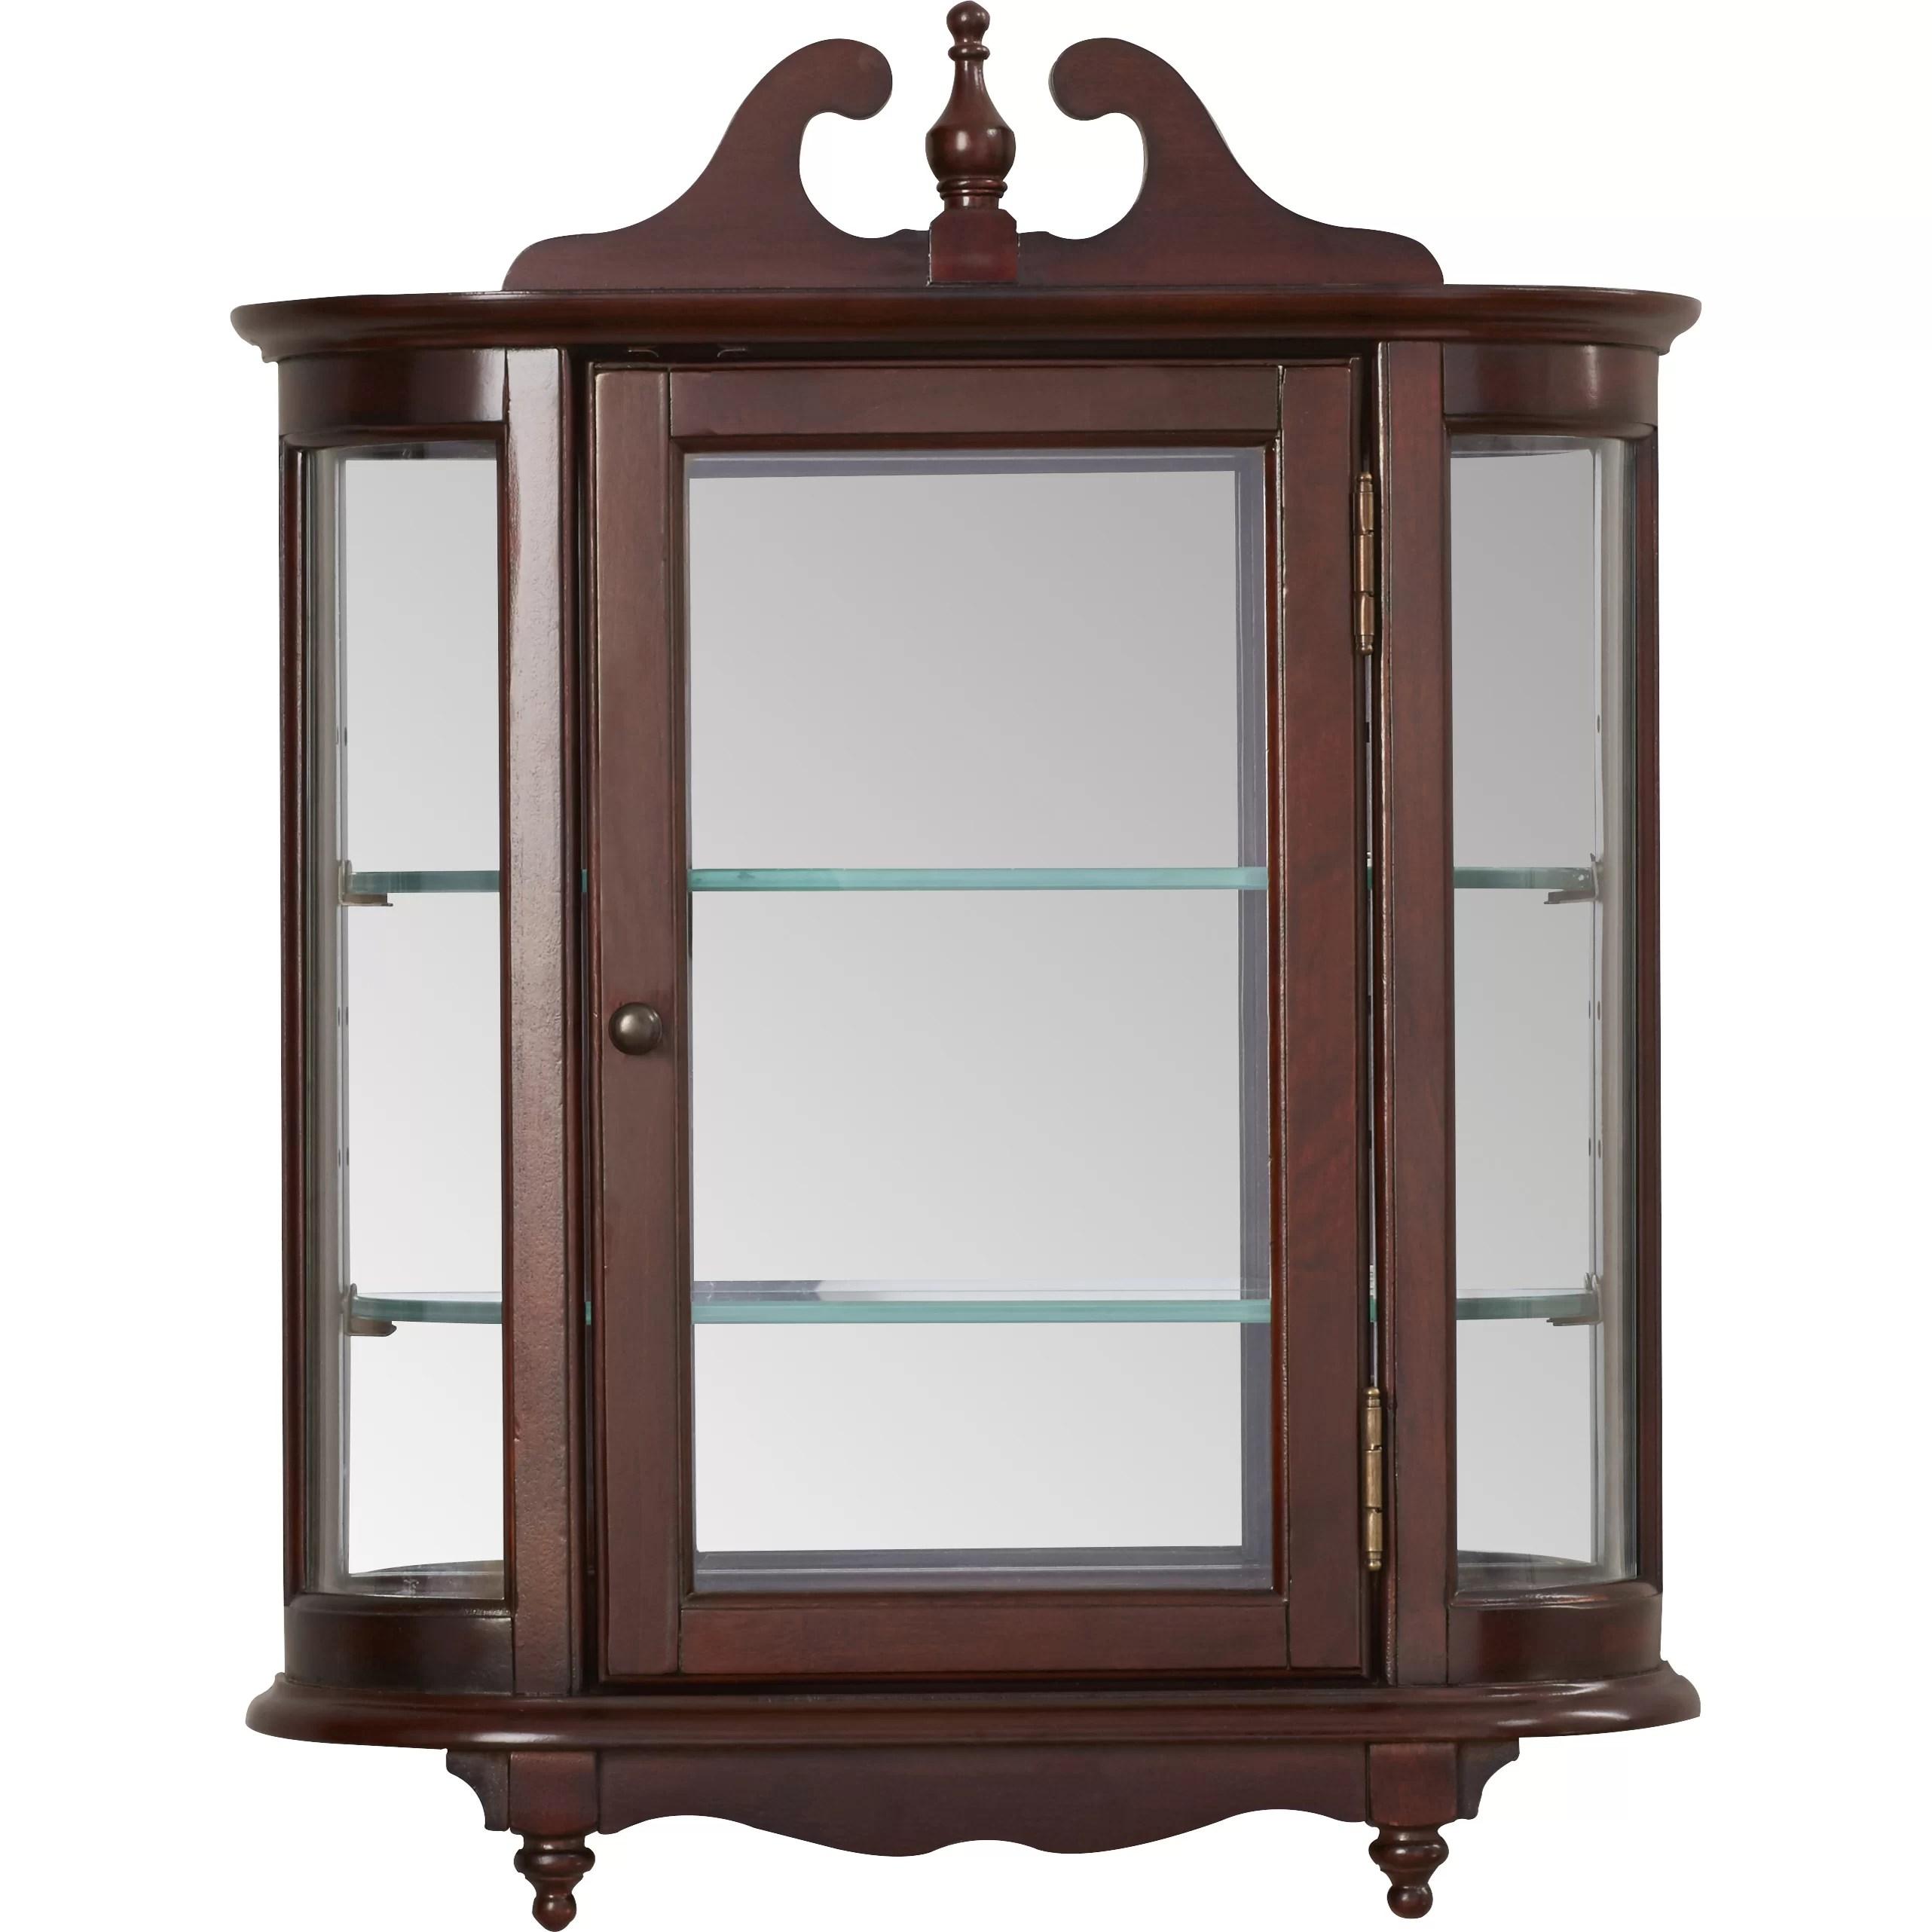 Wall Curio Cabinets